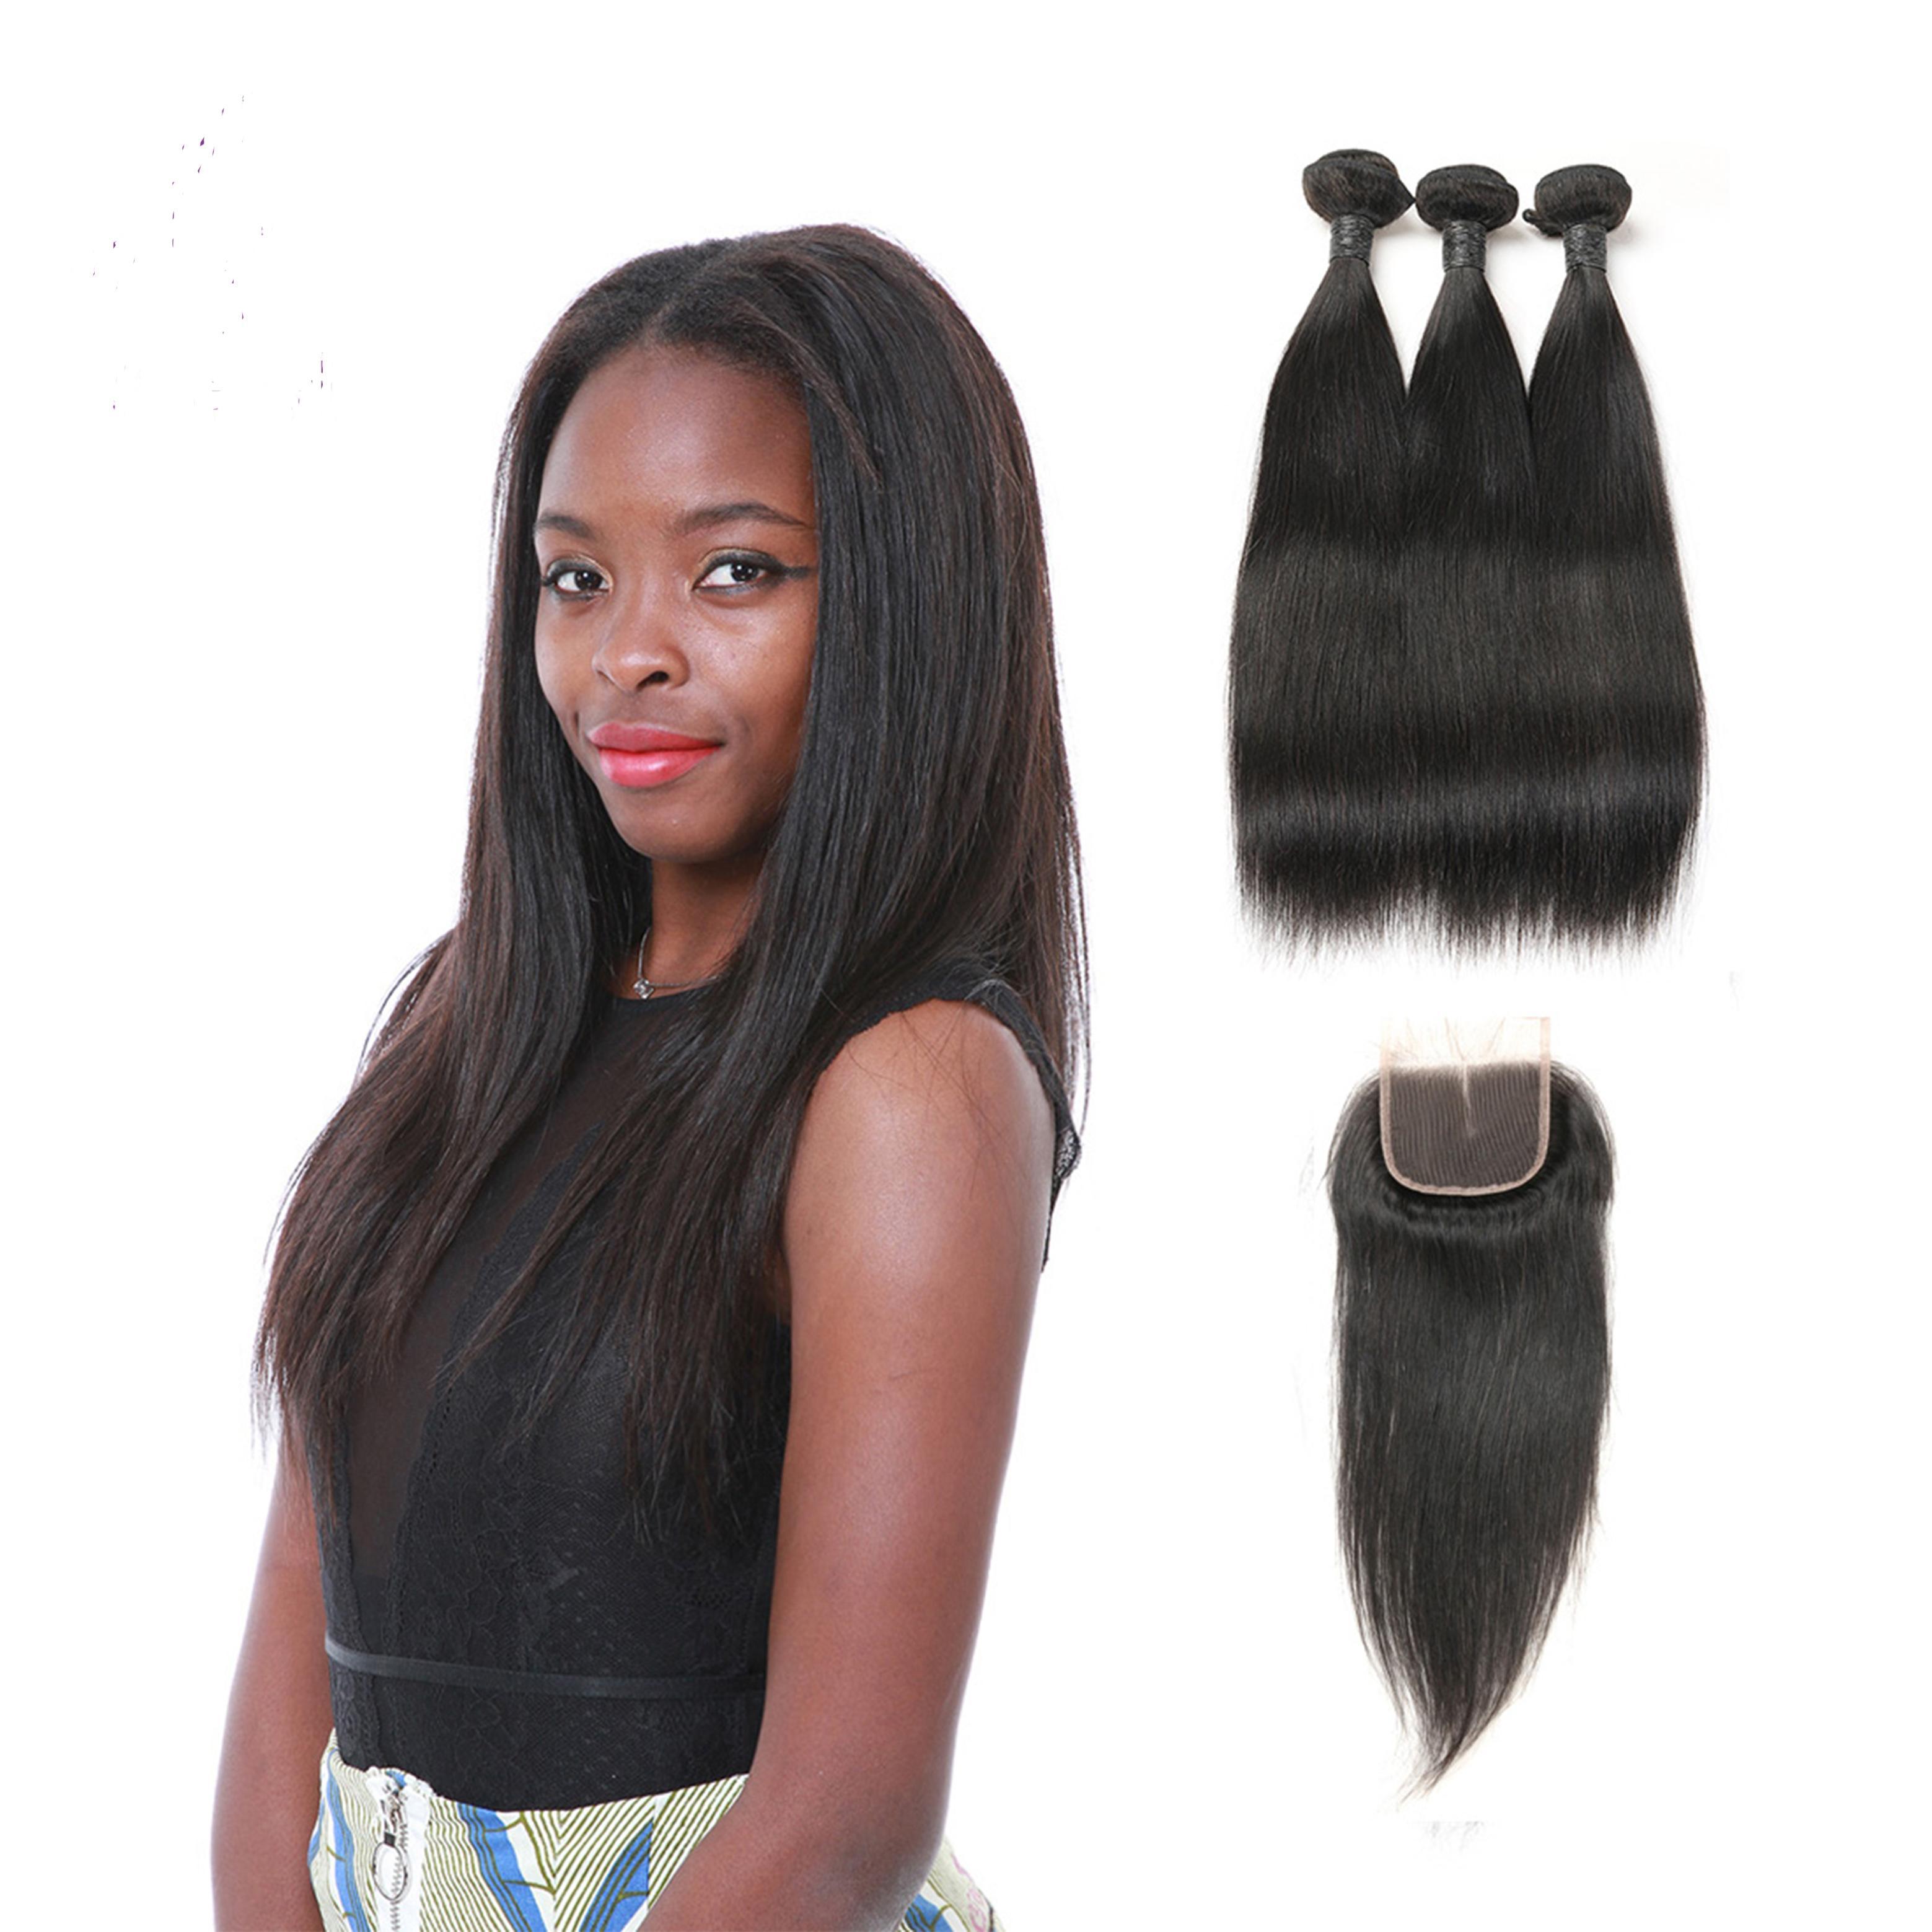 2018 Hot Sale 3 Bundles 100 Human Hair Weaving Silky Brazilian